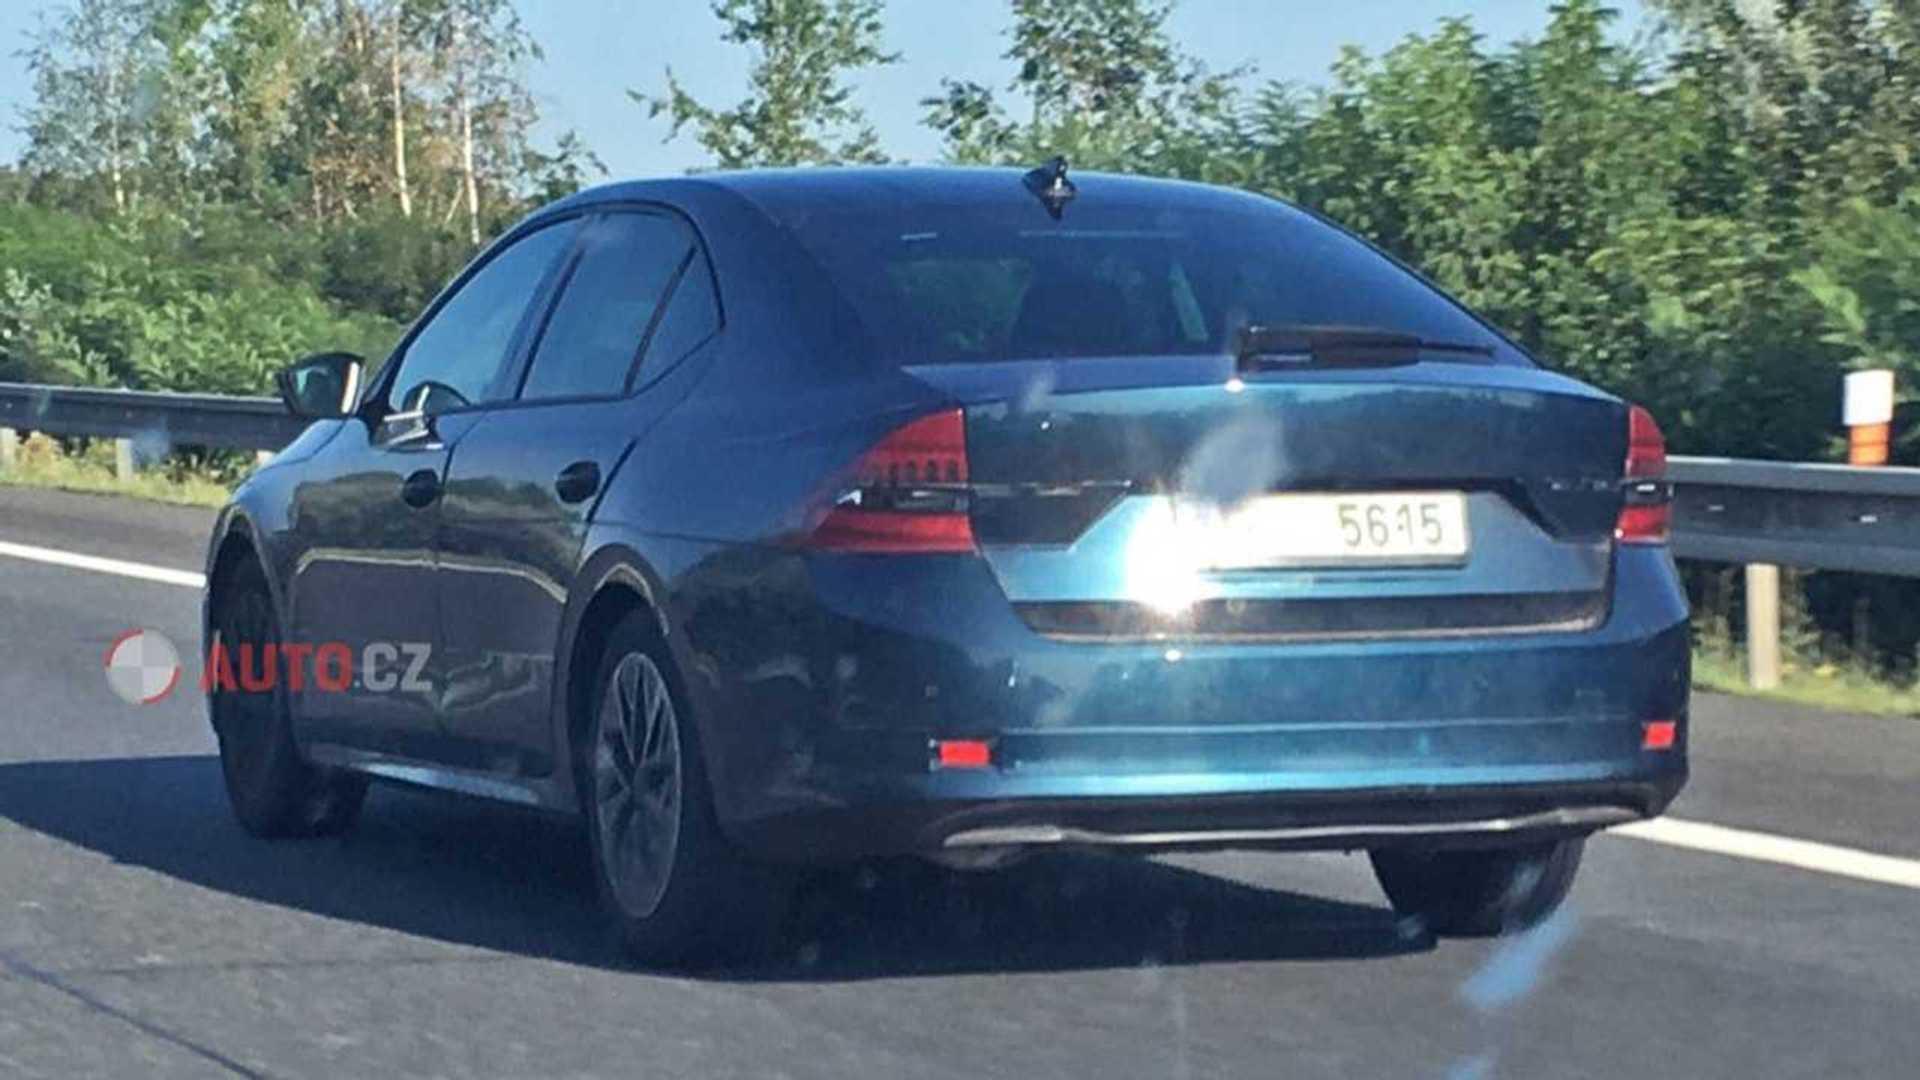 2019 - [Skoda] Octavia IV - Page 4 2020-skoda-octavia-hatchback-spy-photo